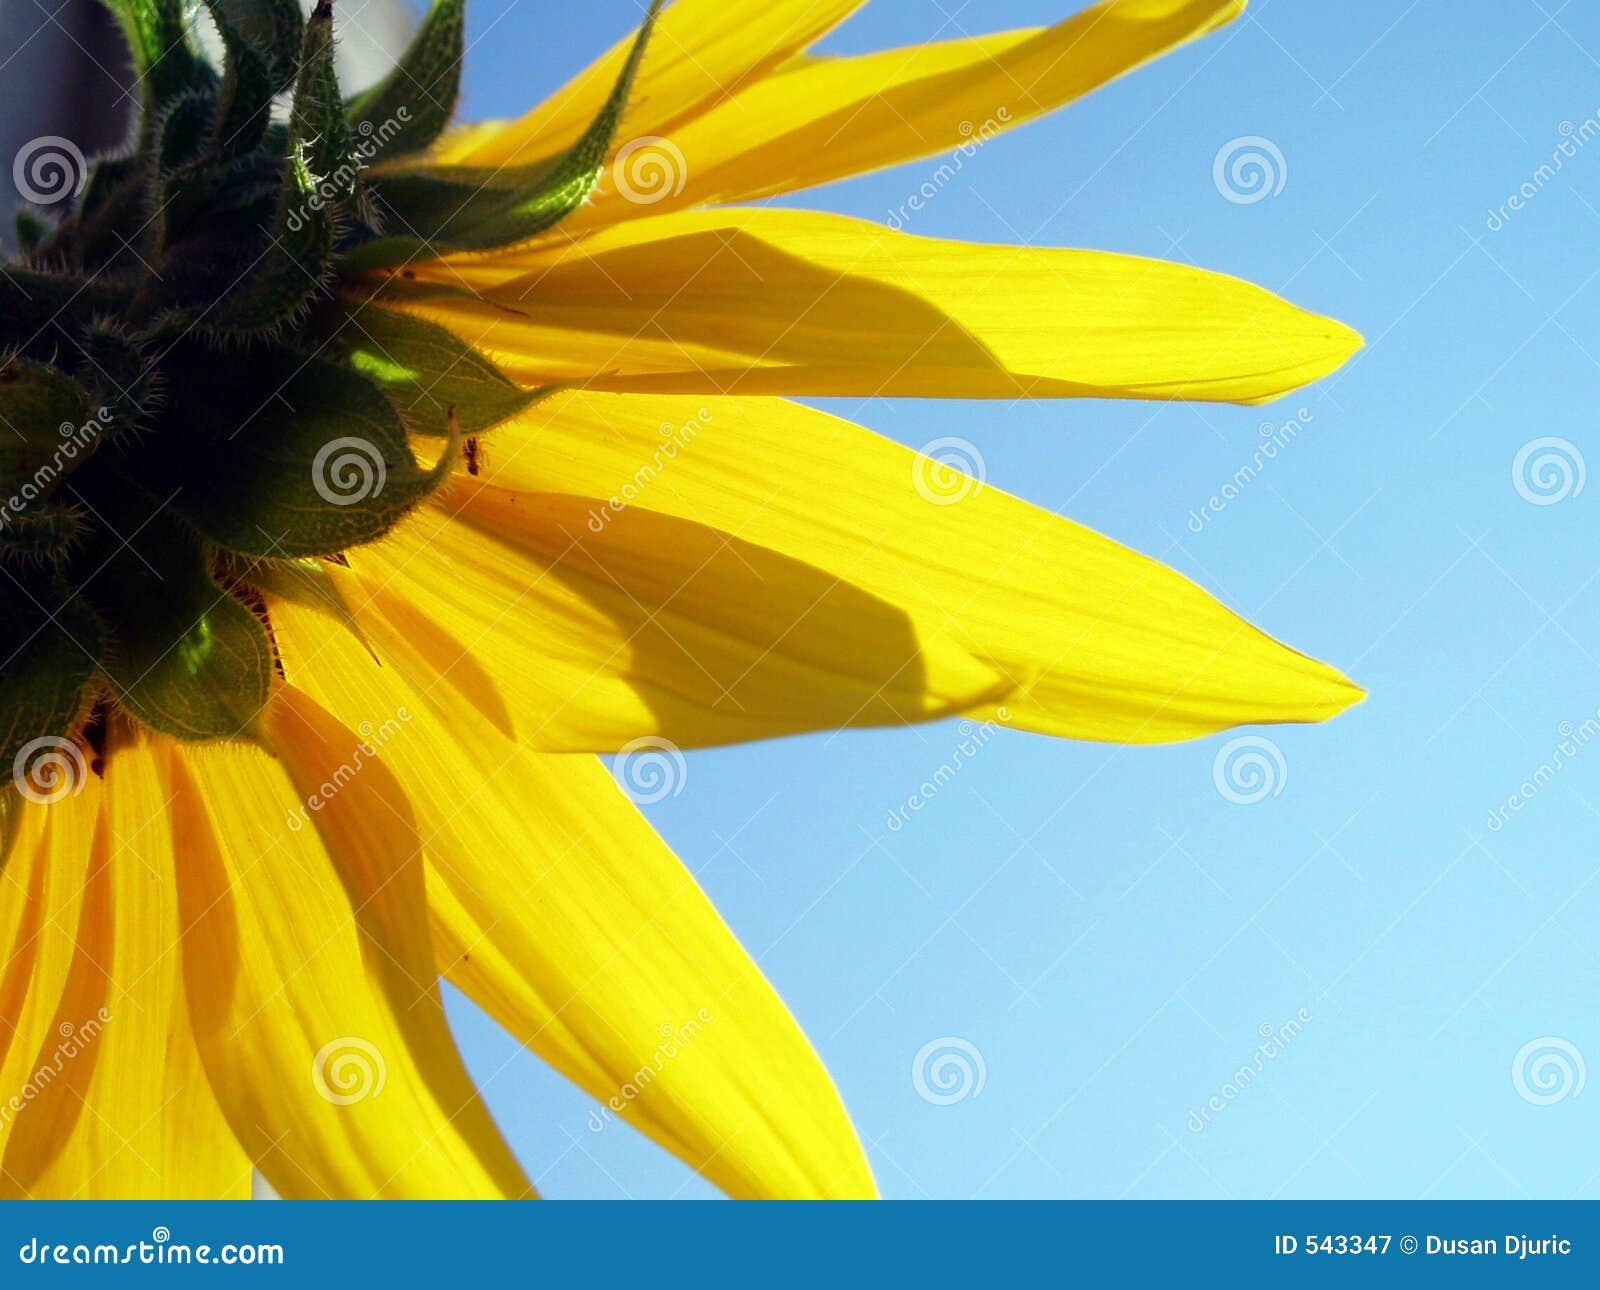 Download 回到向日葵 库存图片. 图片 包括有 工厂, belia, 塞尔维亚, 绿色, 草甸, 关闭, 天空, 庭院 - 543347